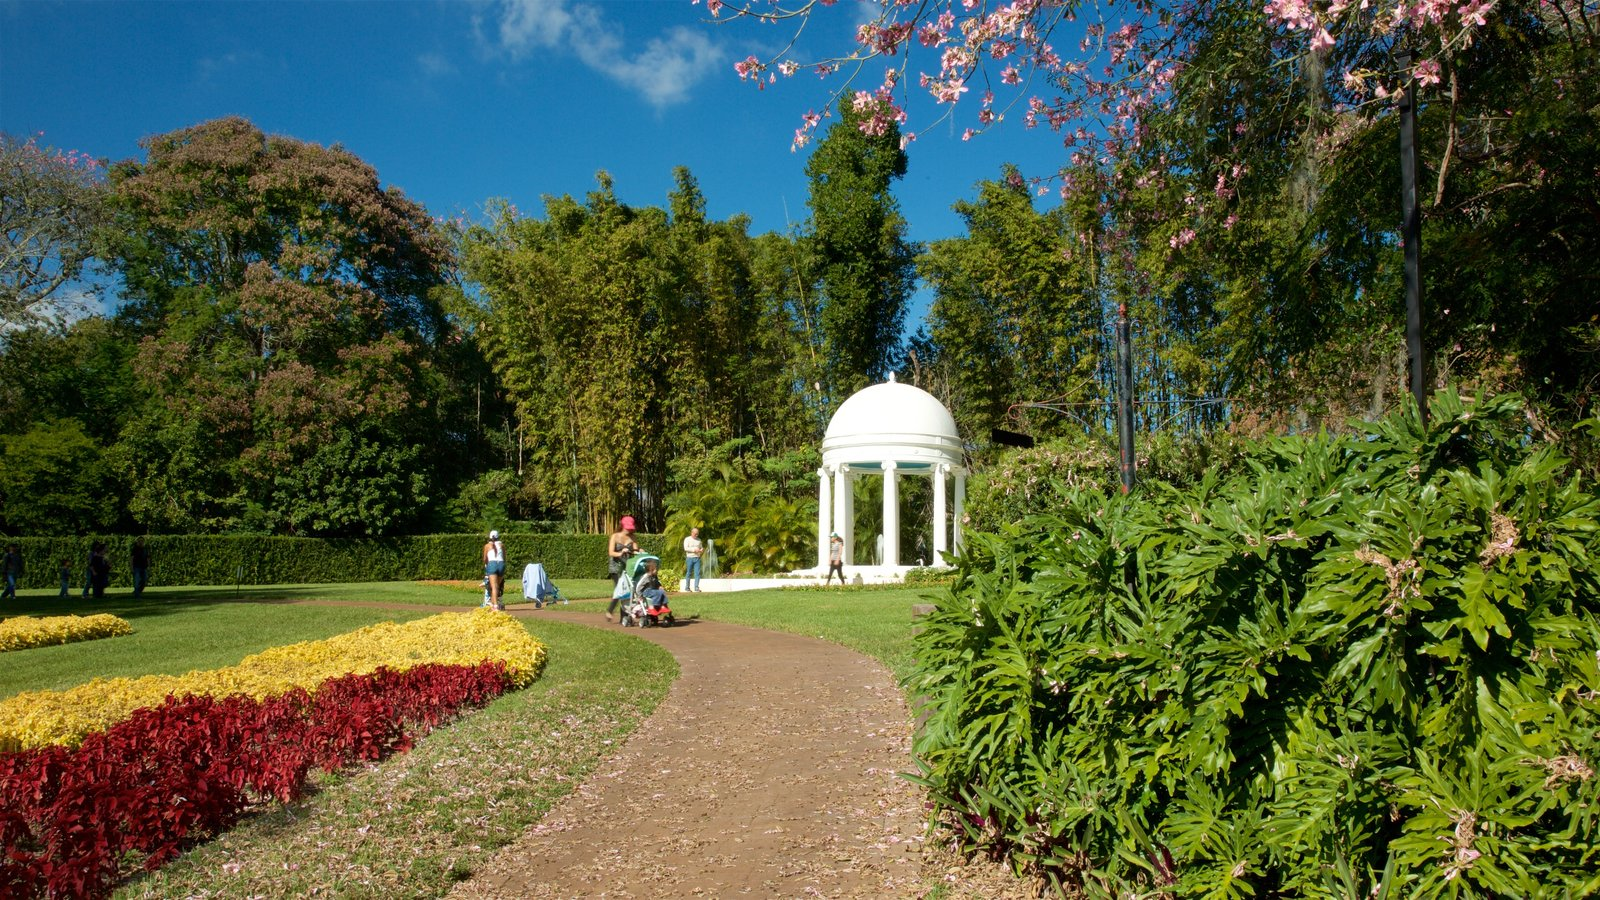 gardens u0026 parks pictures view images of legoland florida